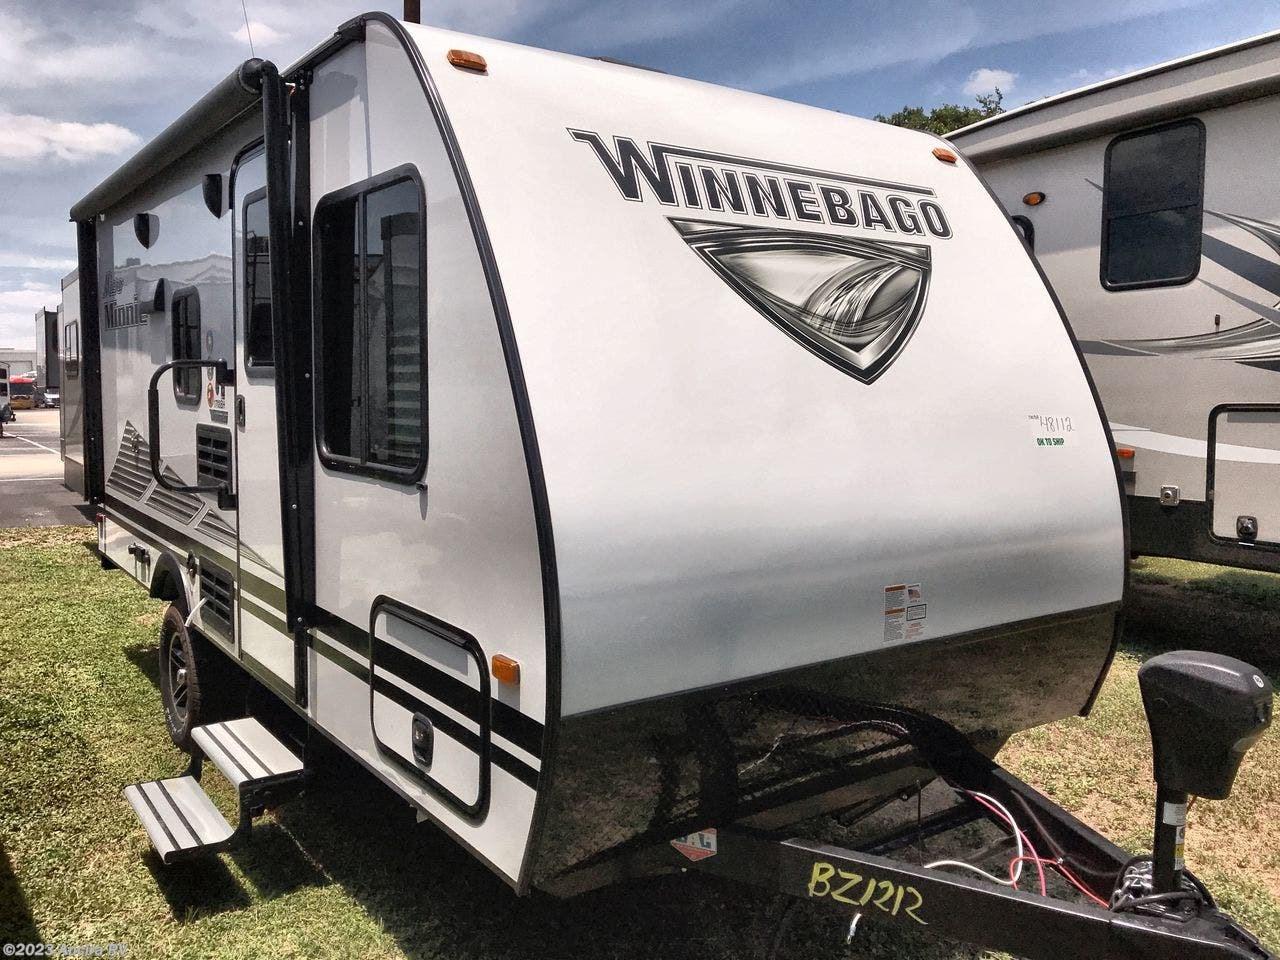 BZ1200 - 2020 Winnebago Micro Minnie 2405RL Travel Trailer for sale